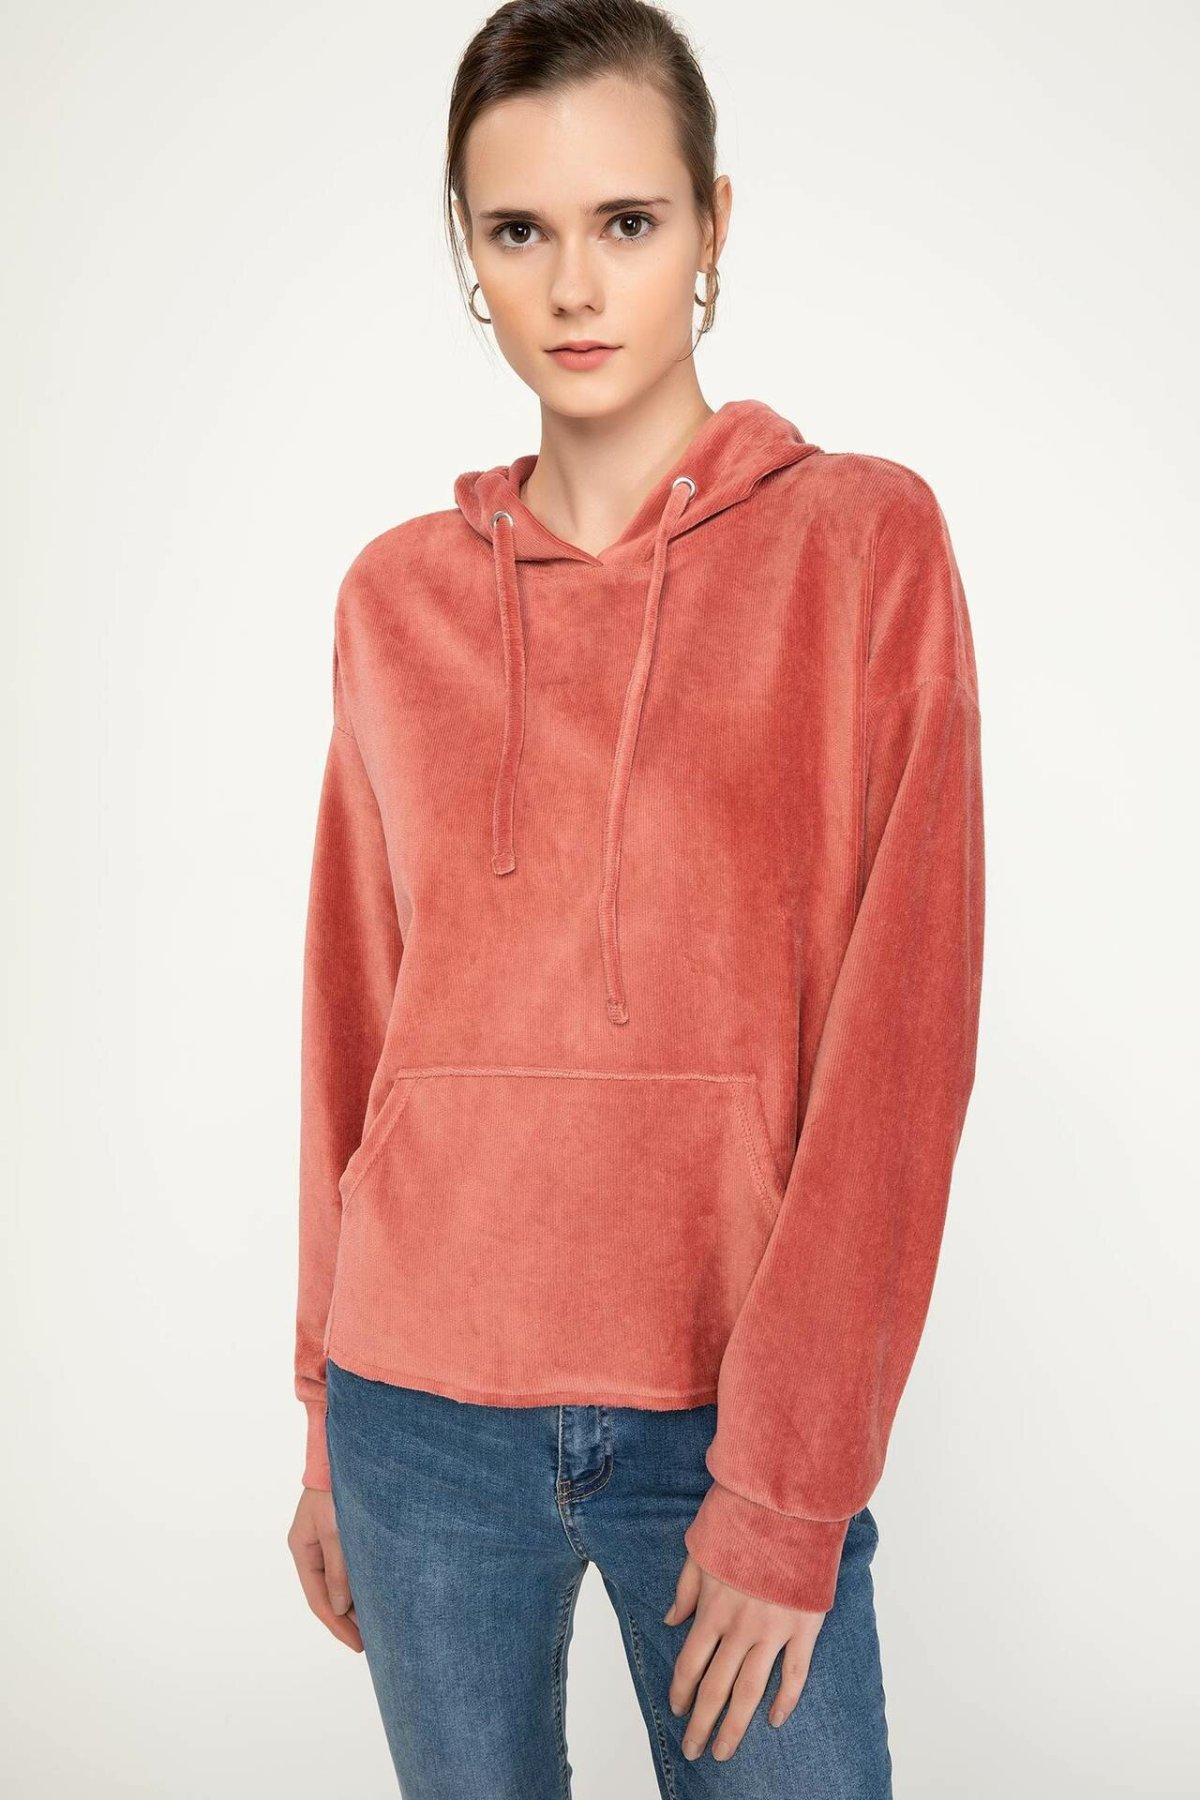 DeFacto Women Casual Pullovers Hoodies Solid Cotton Pullovers Tops Simple Female Pullovers Tops New-J9890AZ18WN-J9890AZ18WN